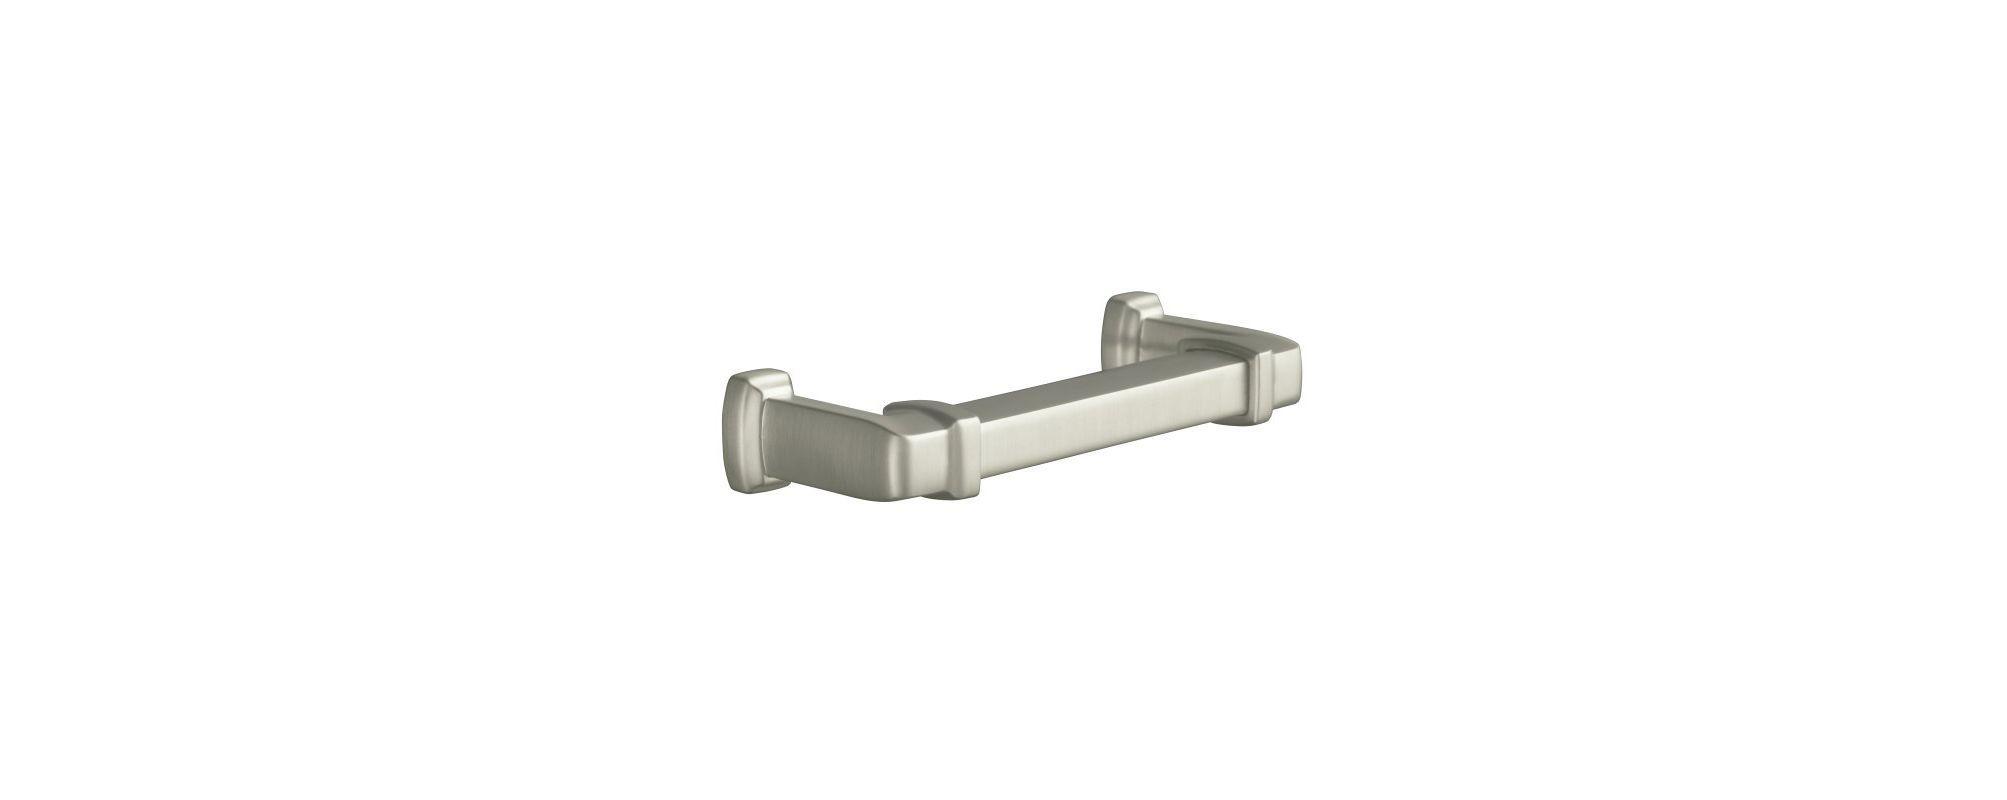 Kohler K-11426 Bancroft Drawer Pull Brushed Nickel Accessory Cabinet Hardware Pull